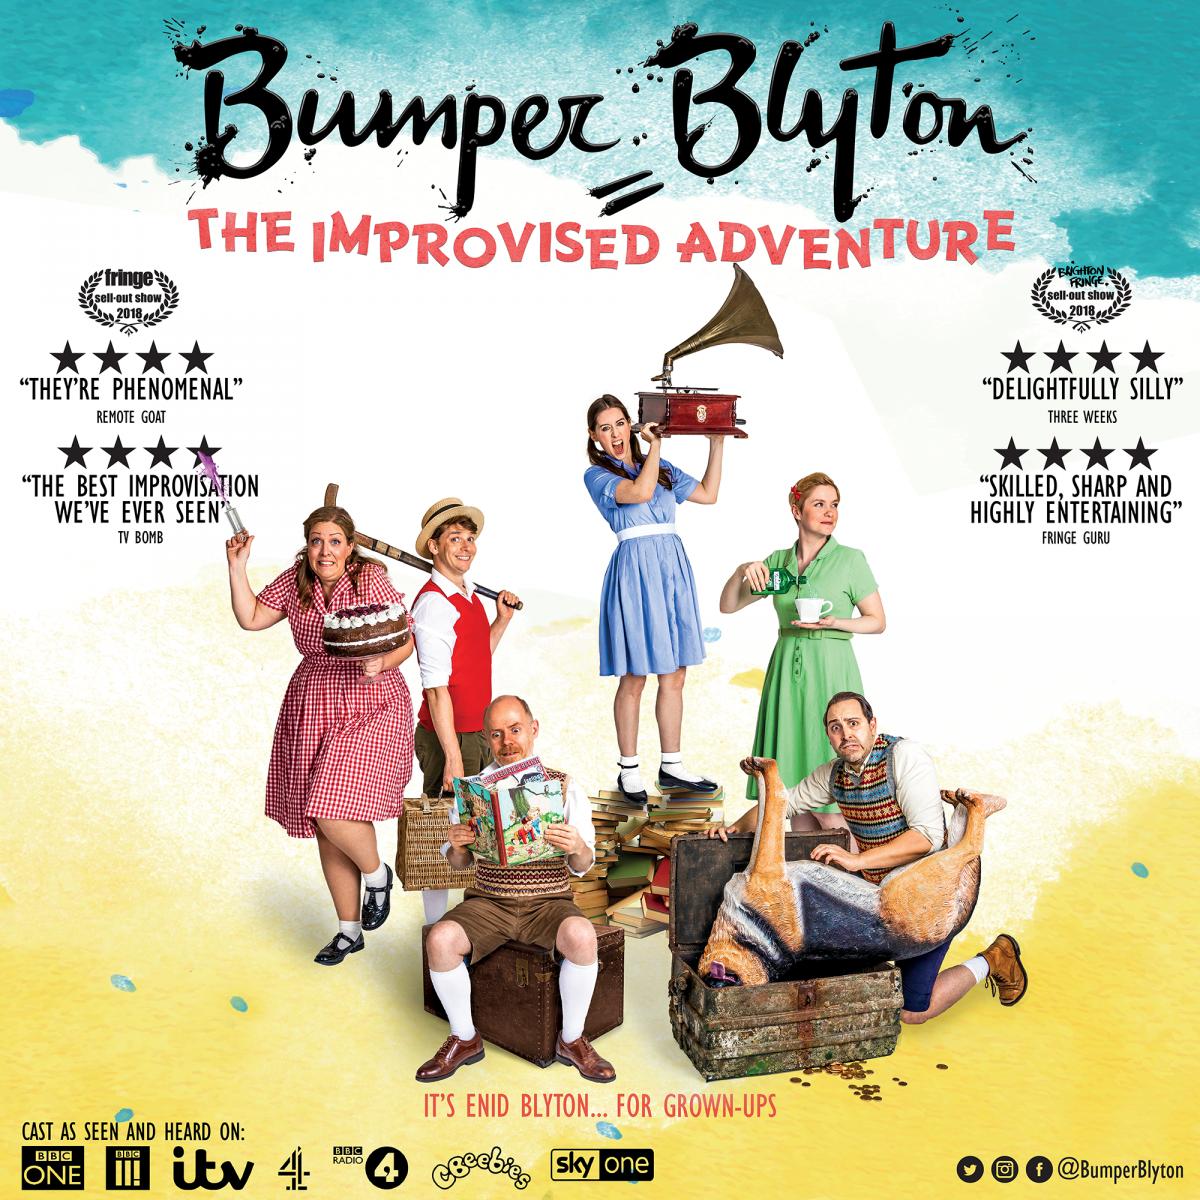 Bumper Blyton